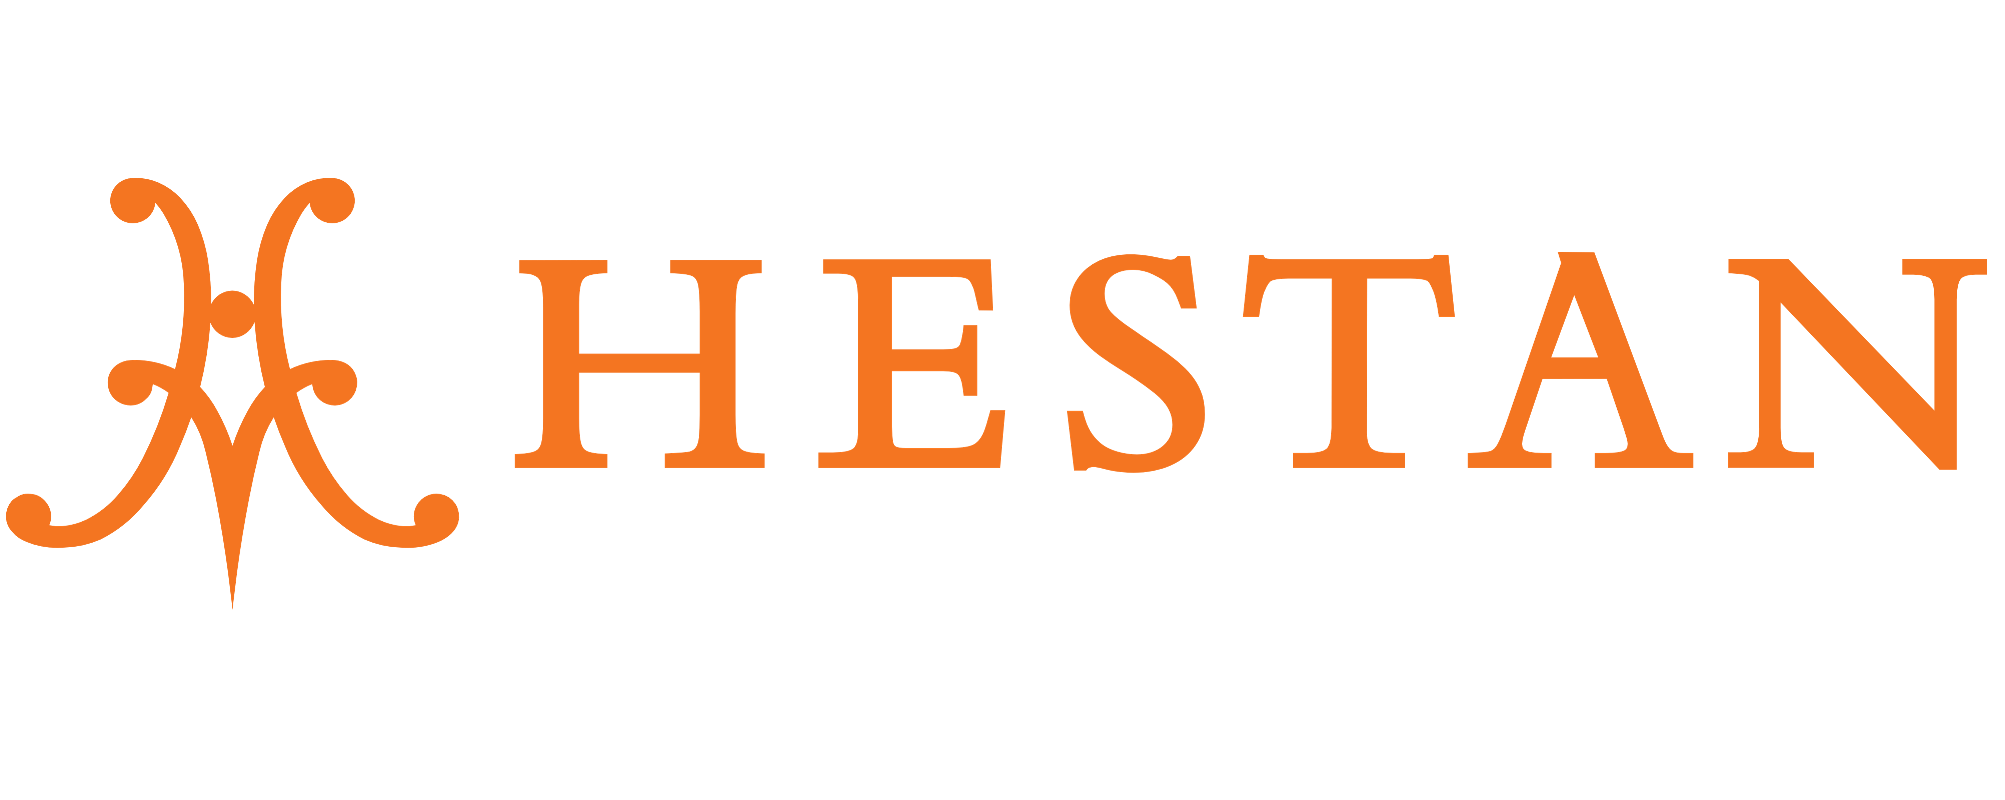 hestan-logox.png